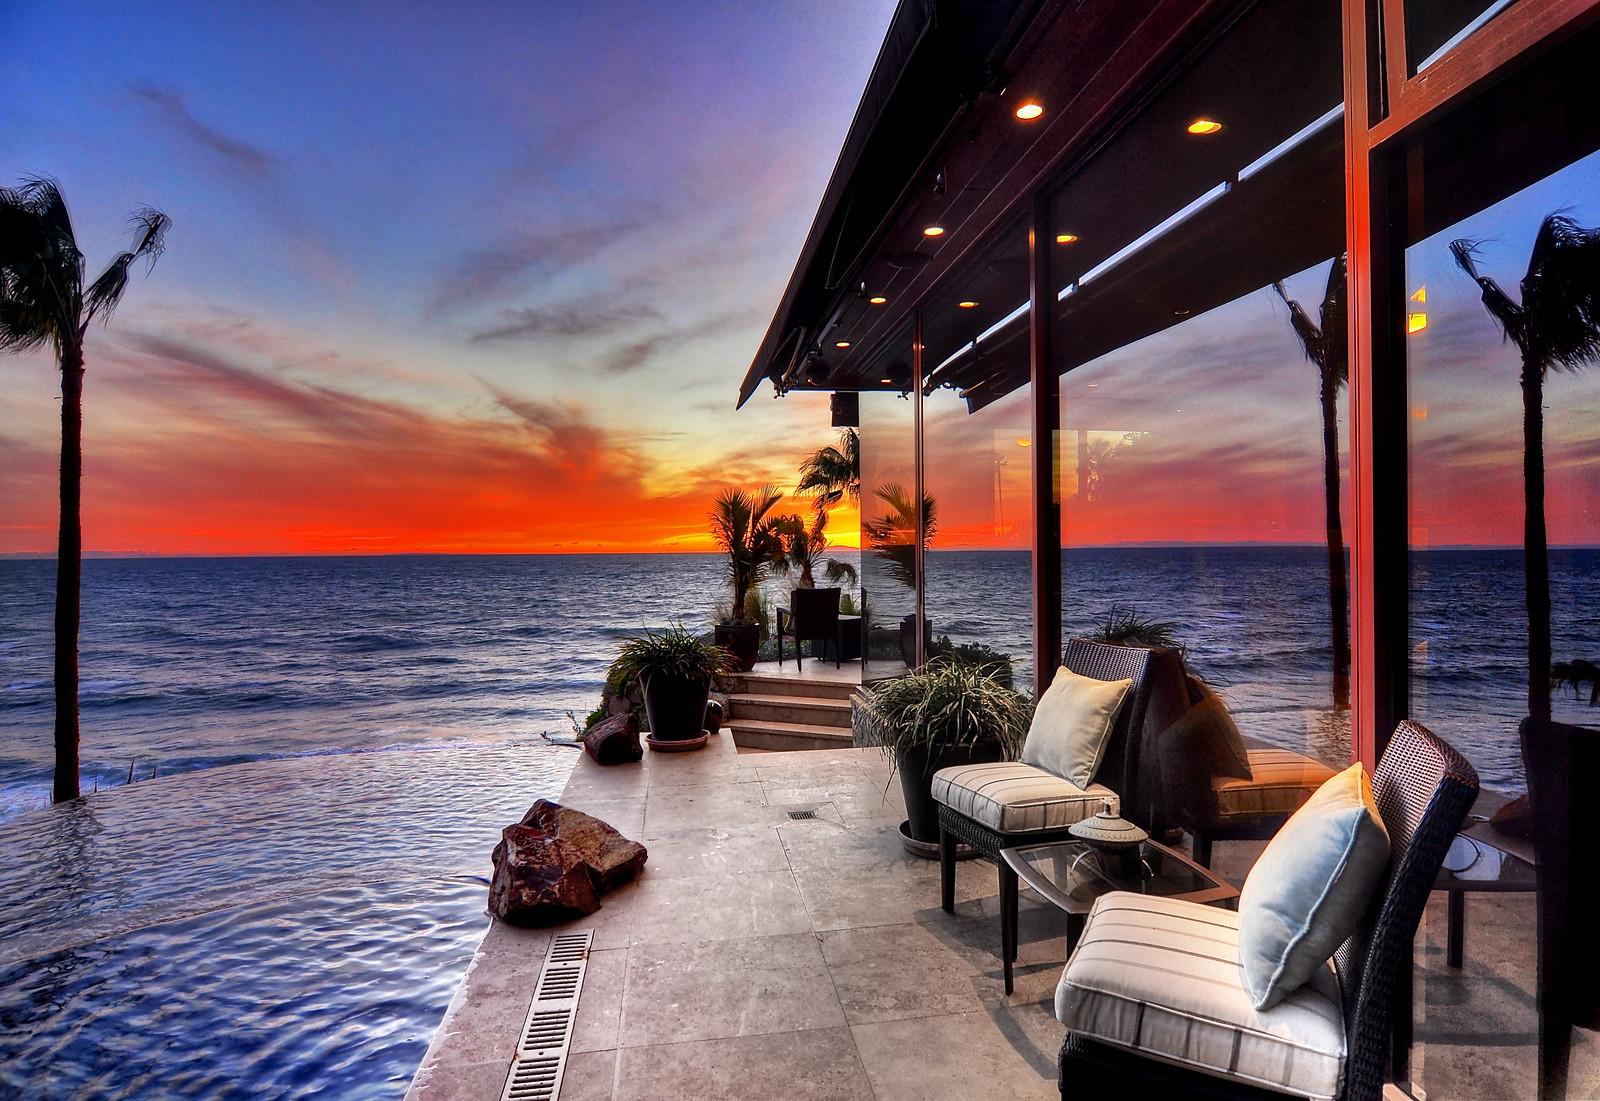 Casa Dell'Oceano – 31921 Coast Hwy, Laguna Beach